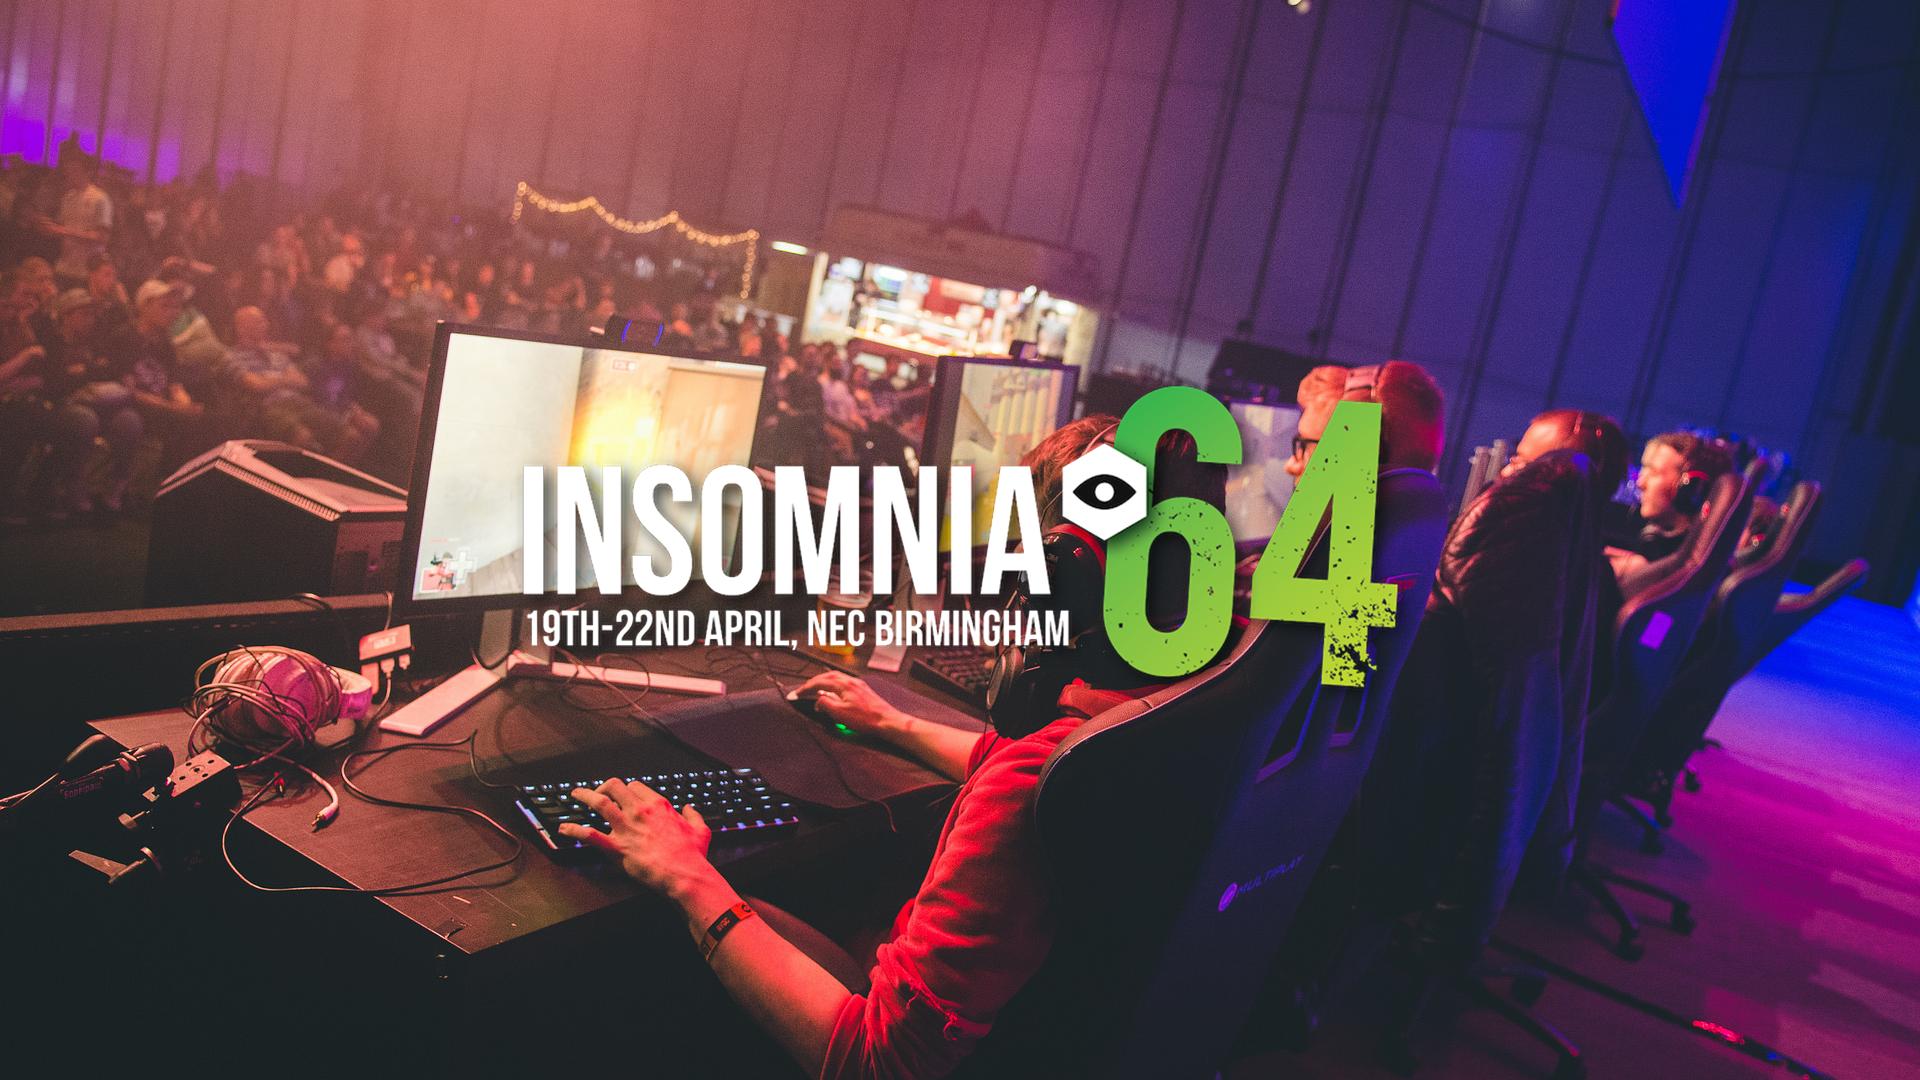 Viperio Staff & Streamers To Attend Insomnia 64